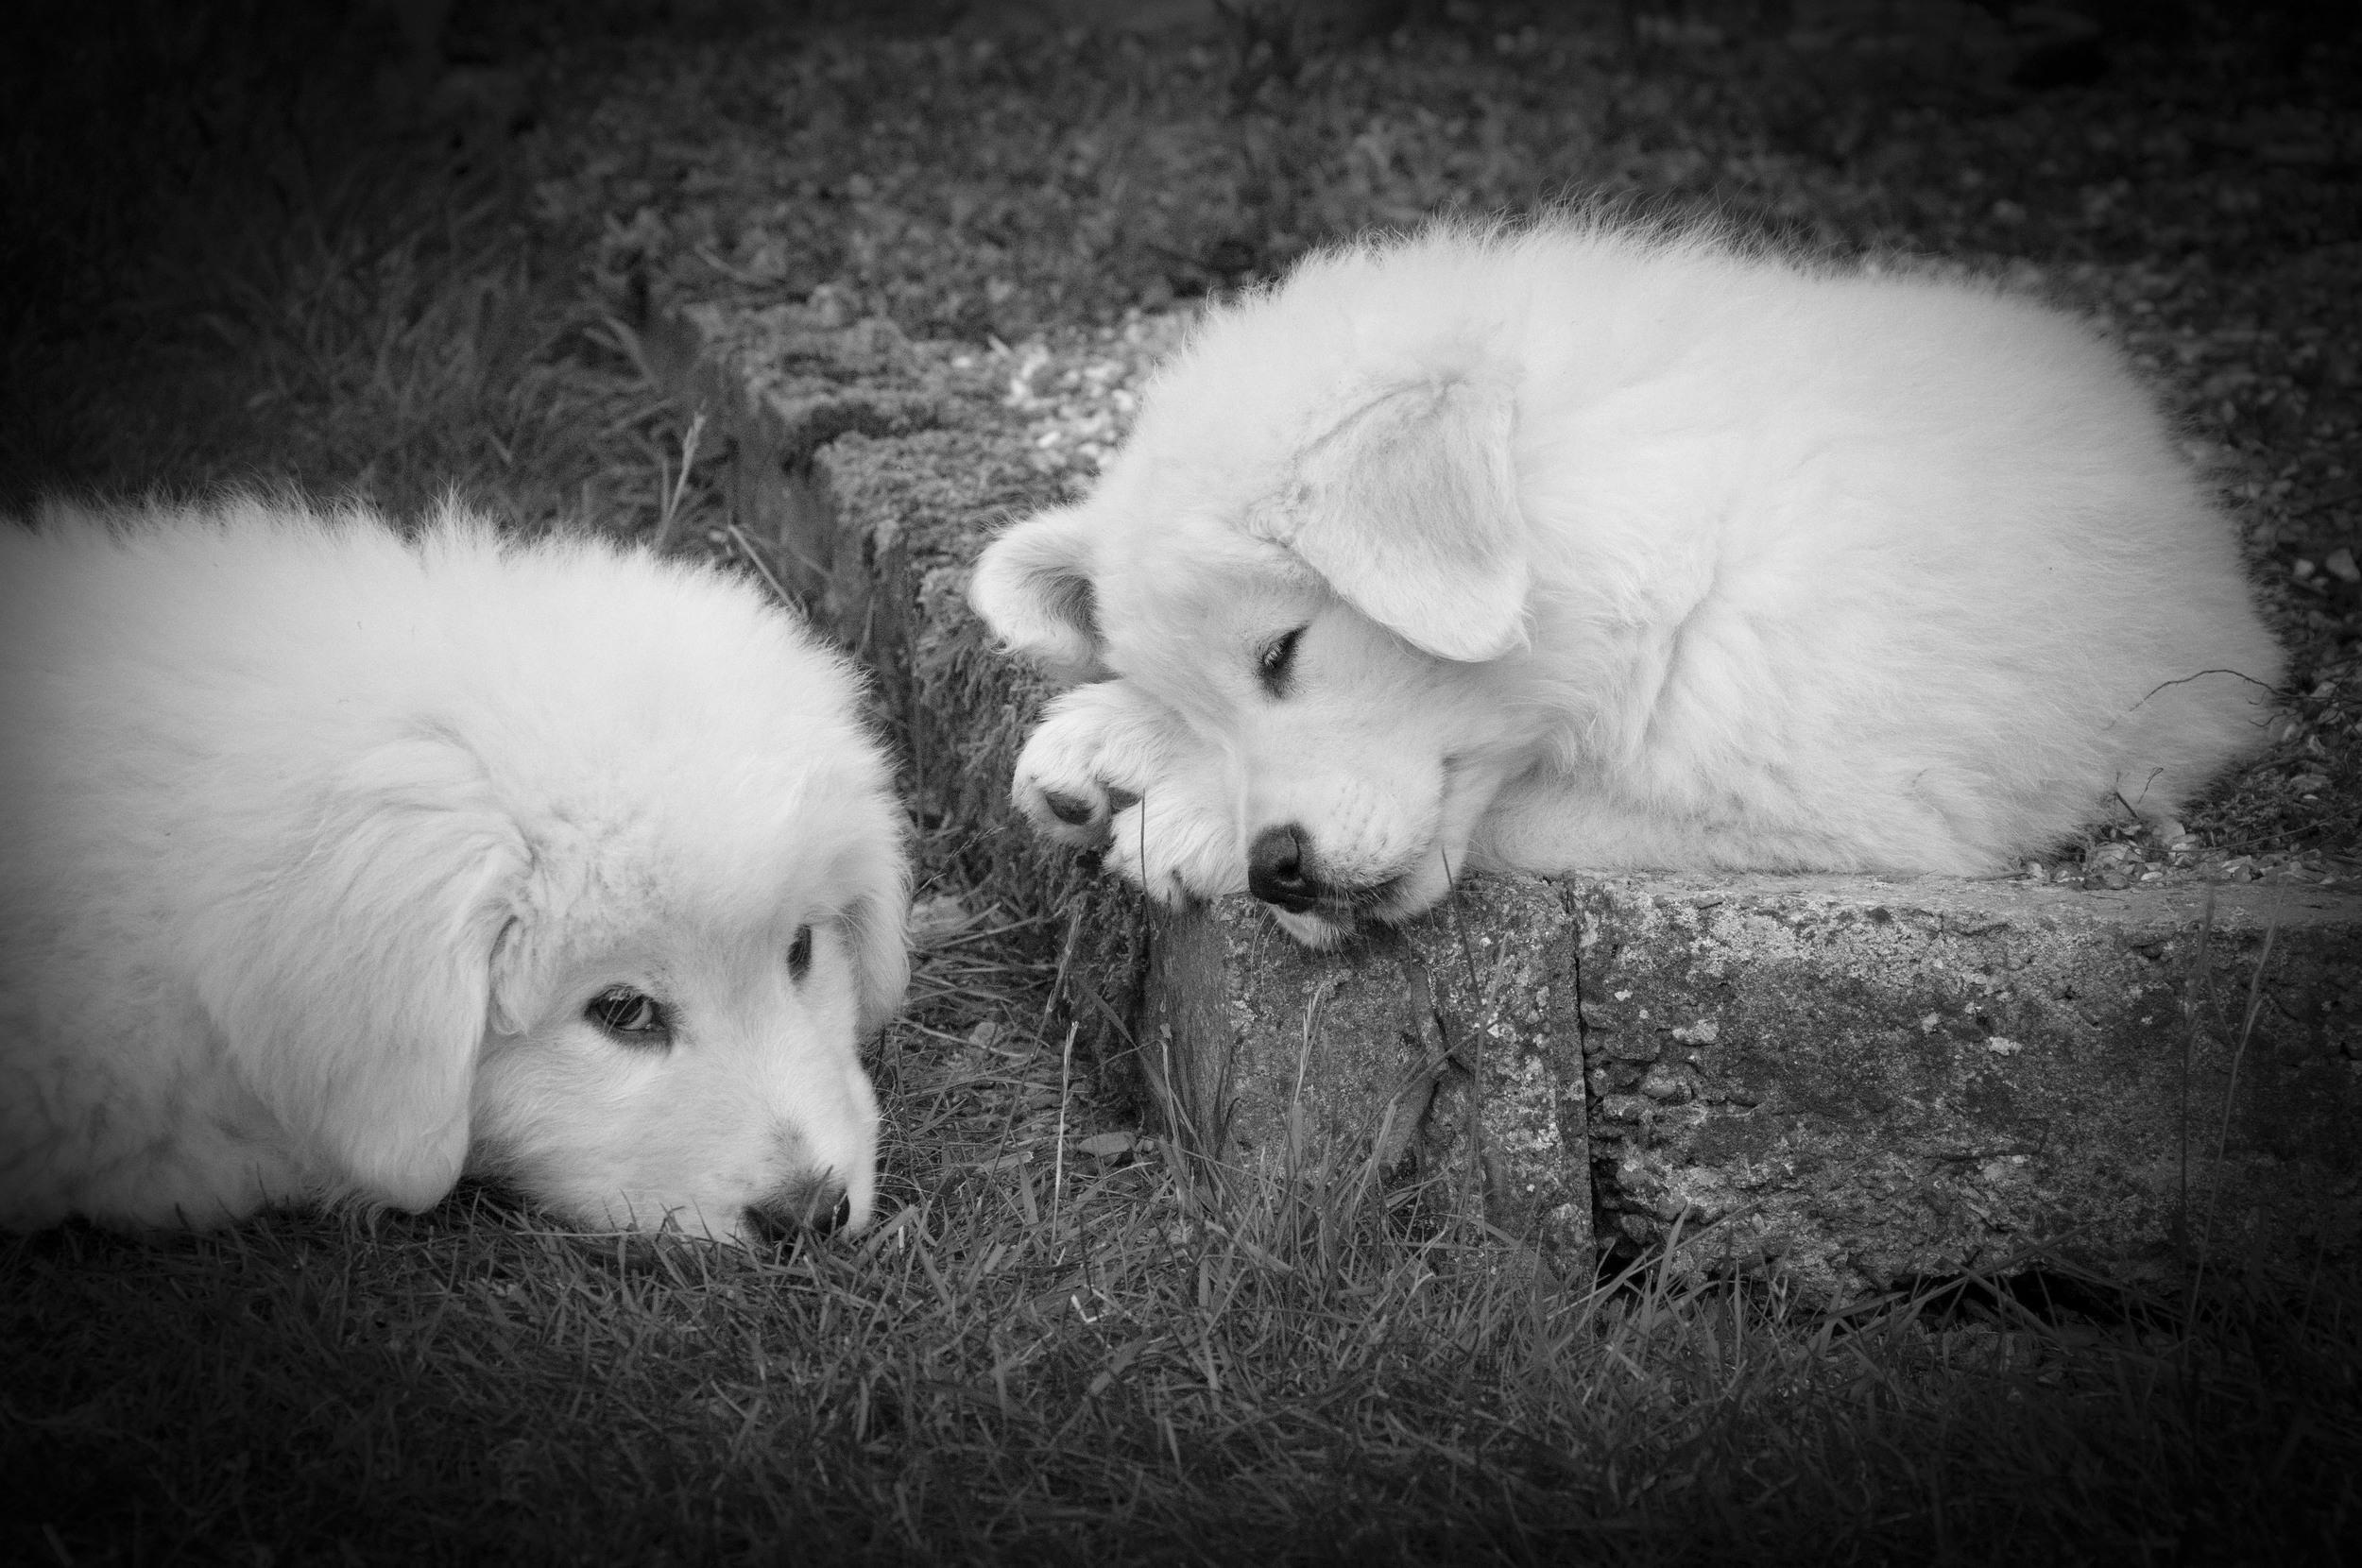 Lucca and Kiki